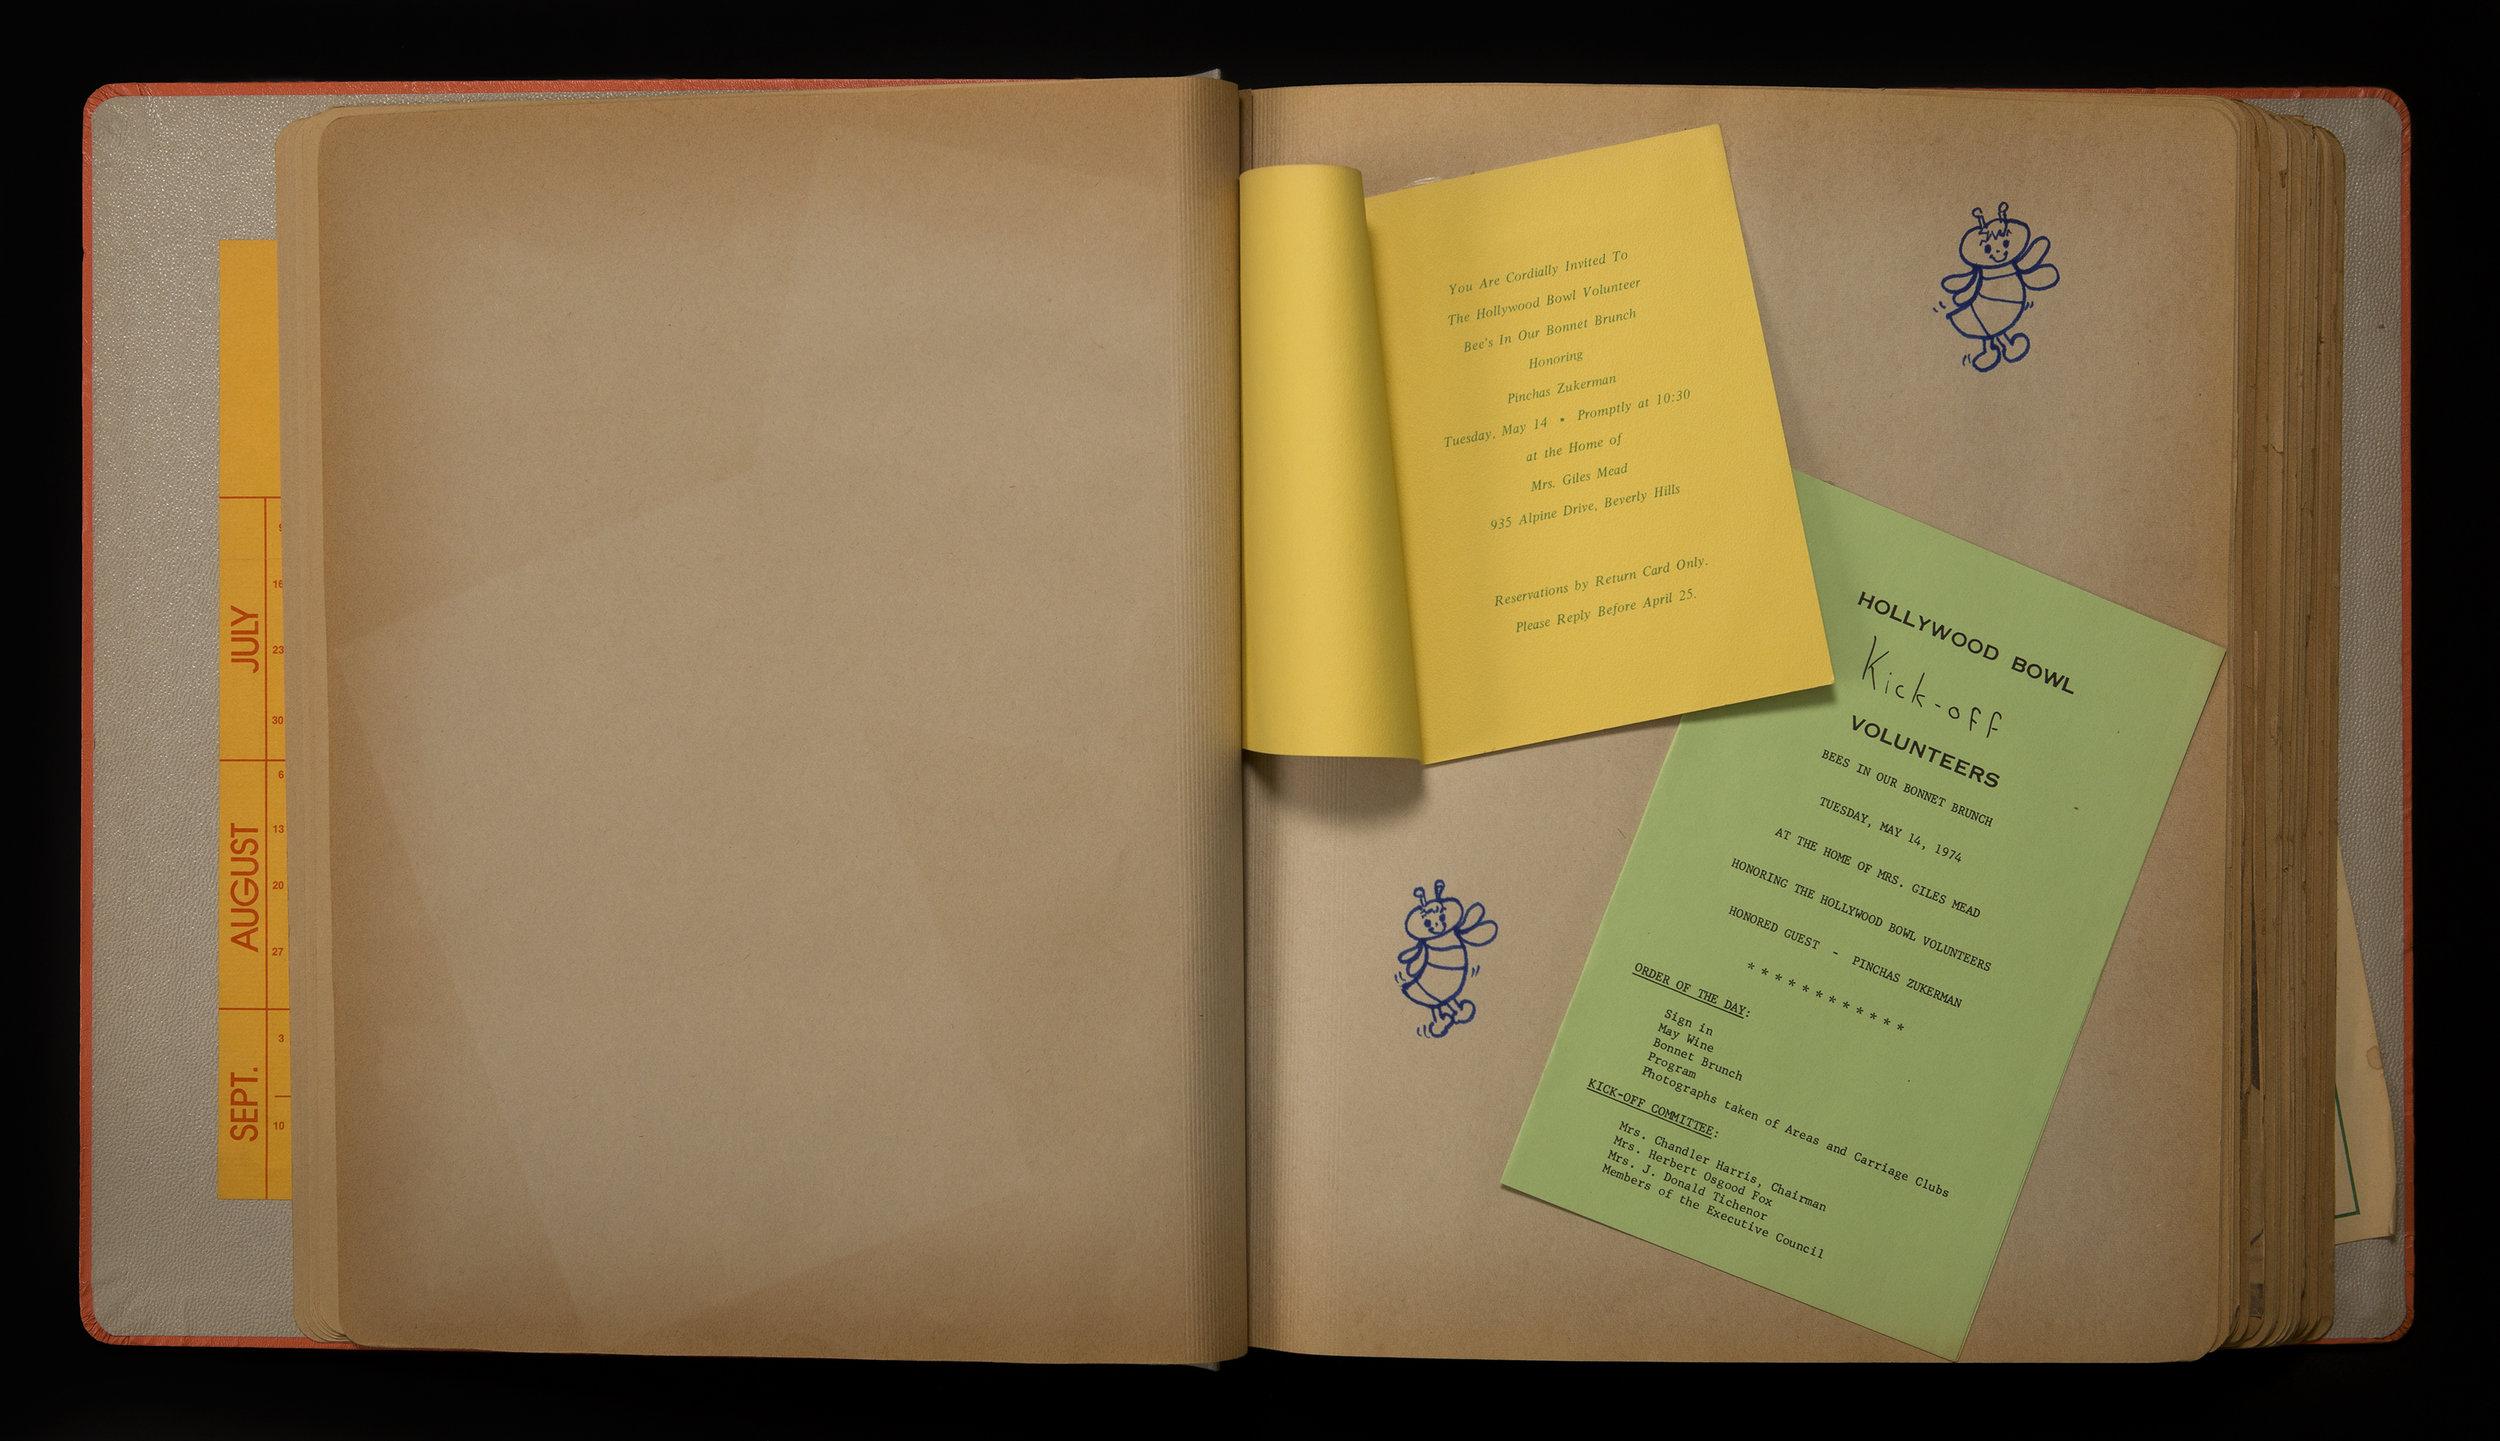 HBVolunteerScrapbook_PageF_B0764_1974.jpg